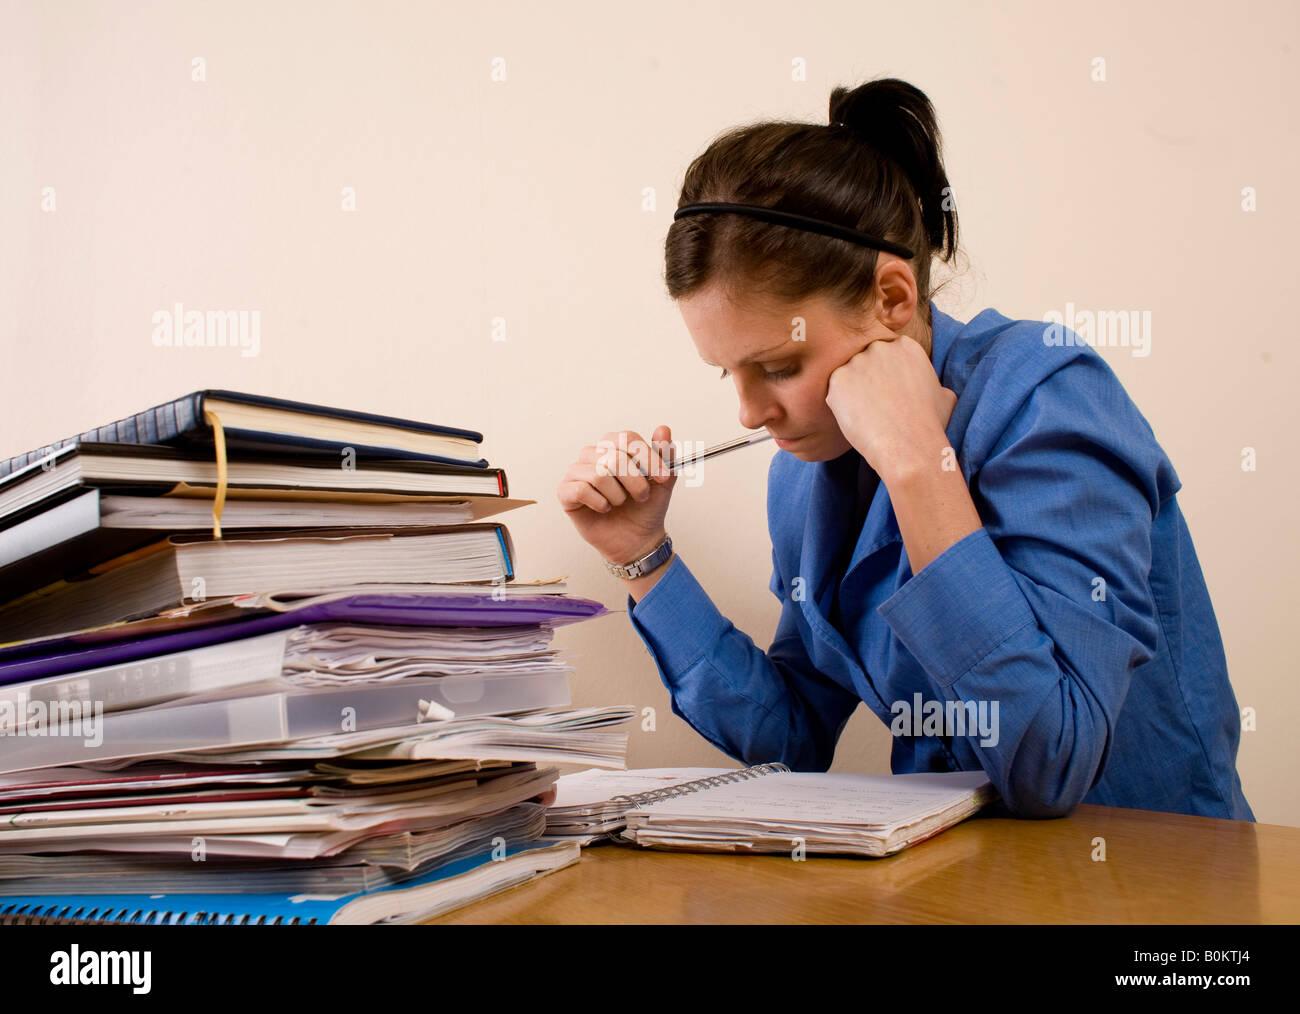 Girl studying for fer exams - Stock Image